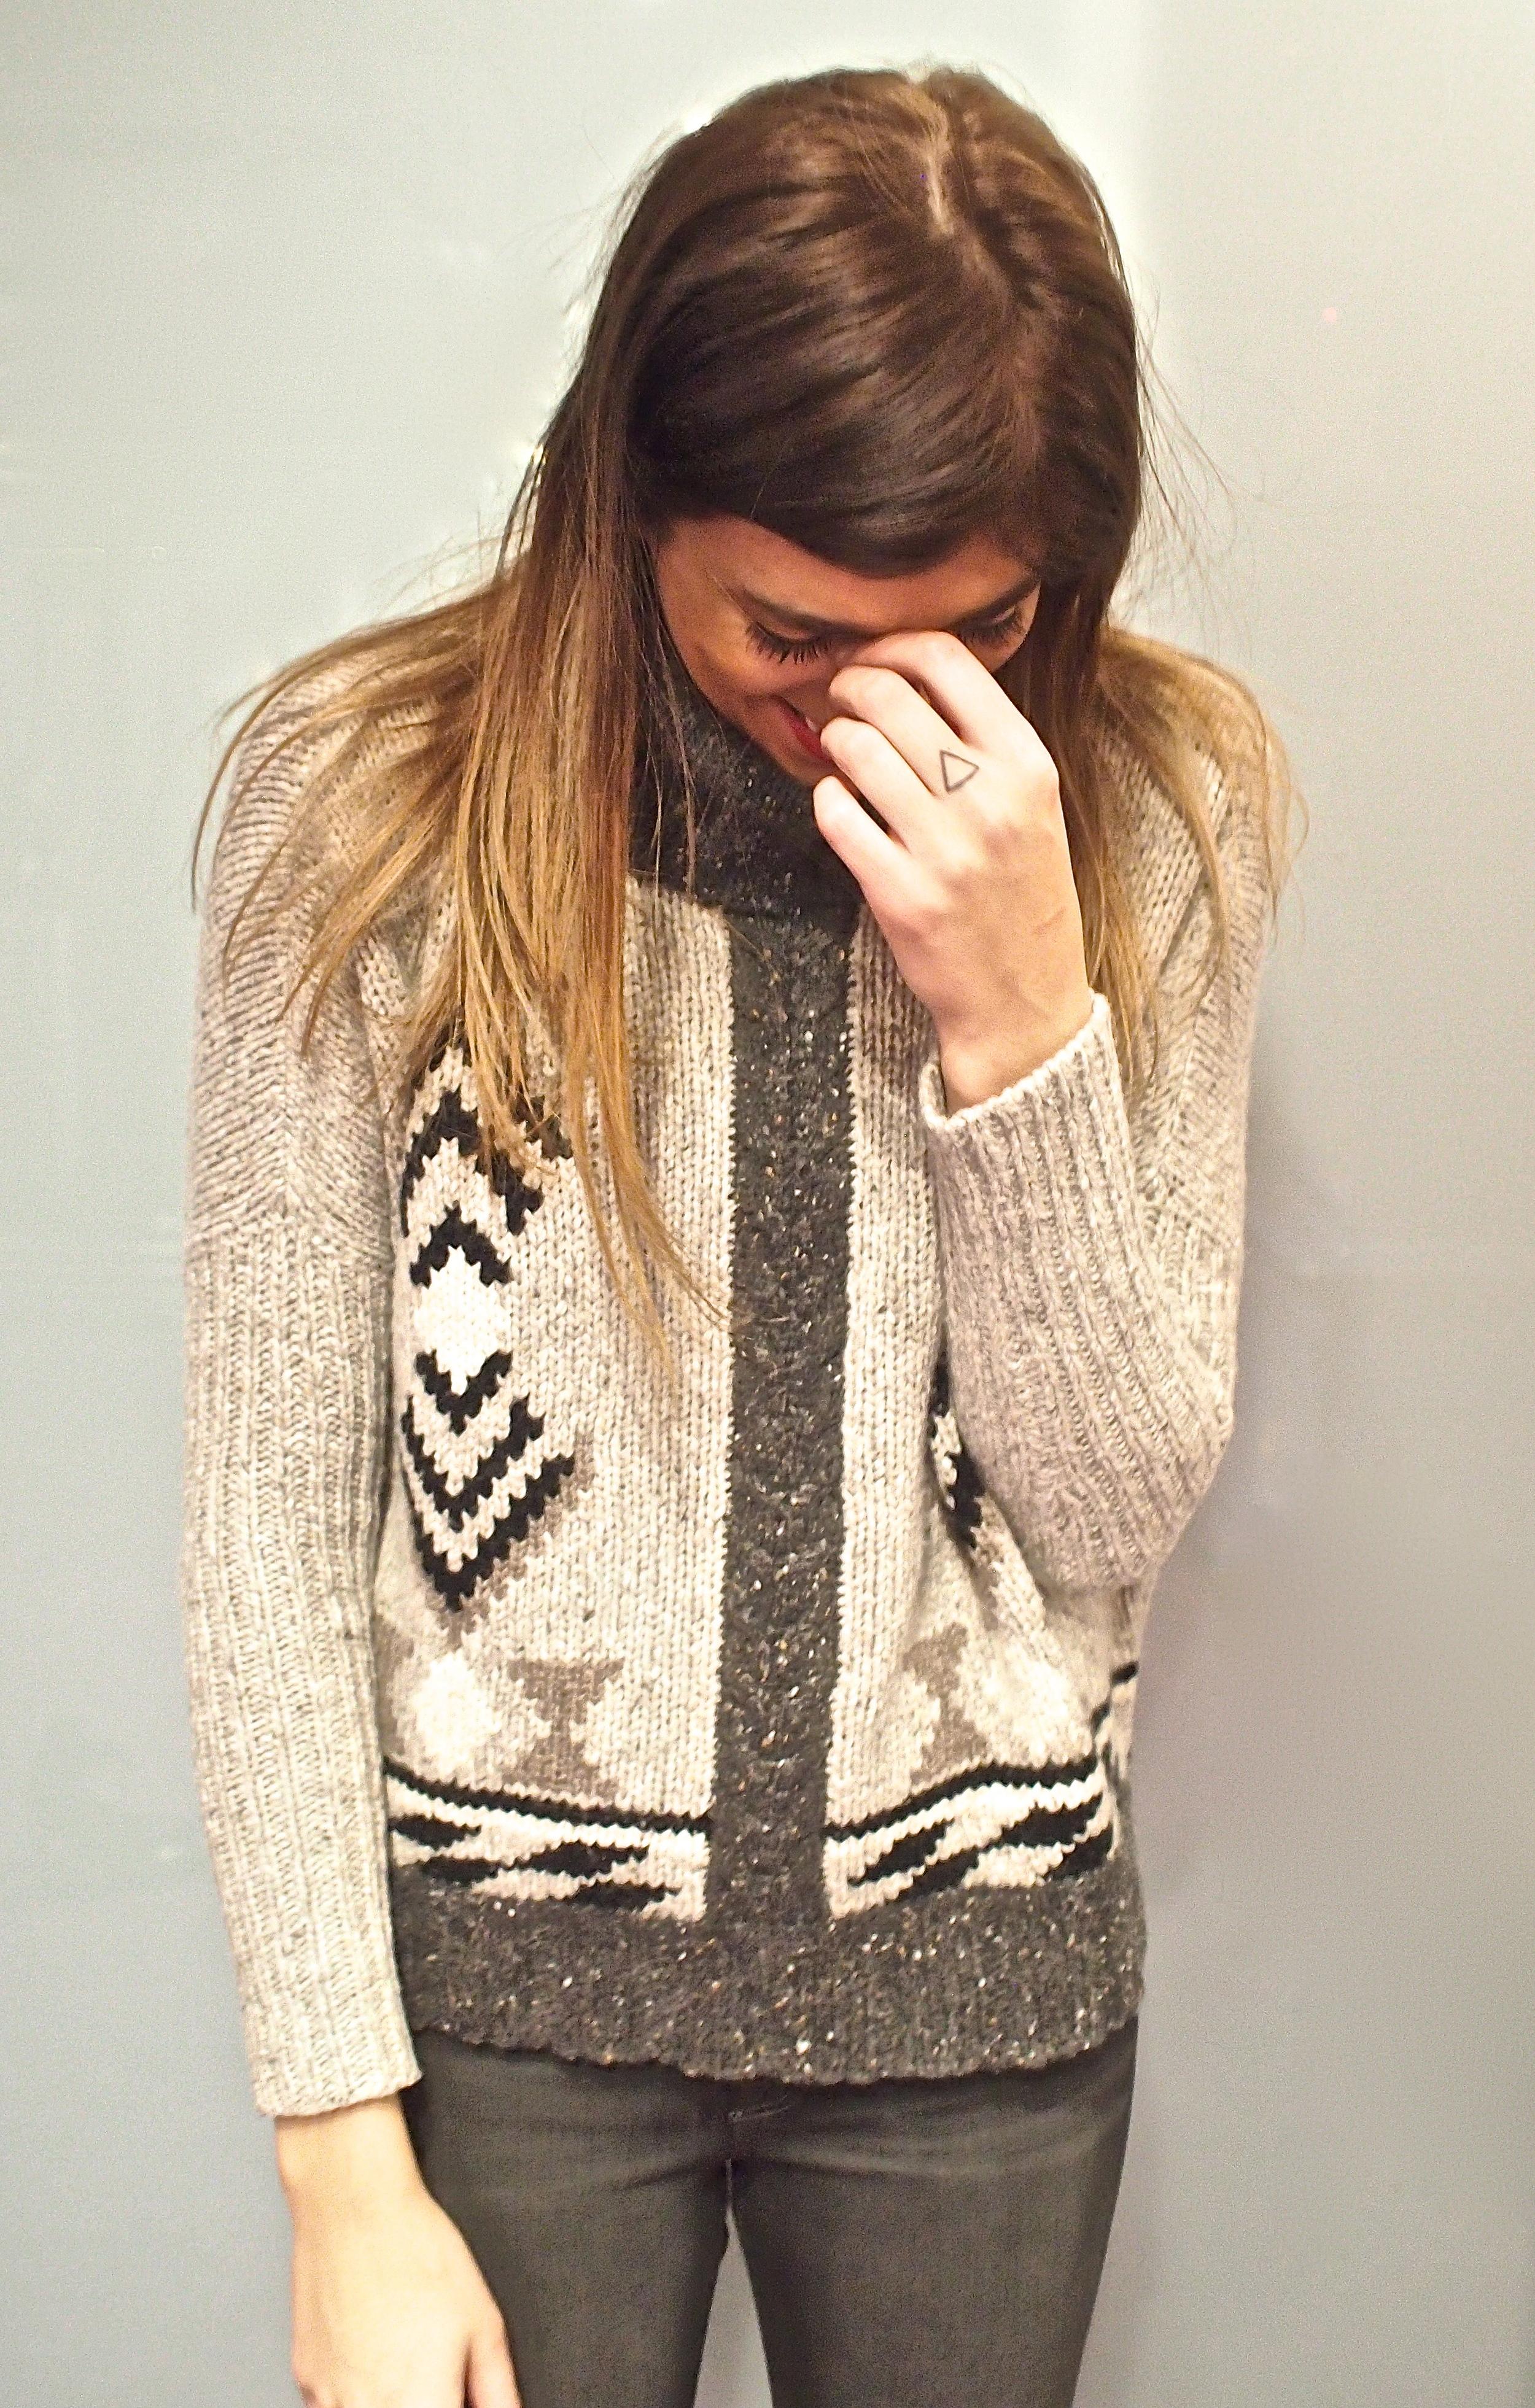 Autumn Cashmere - Southwest Sweater $525, JBrand Skinny Jean $269